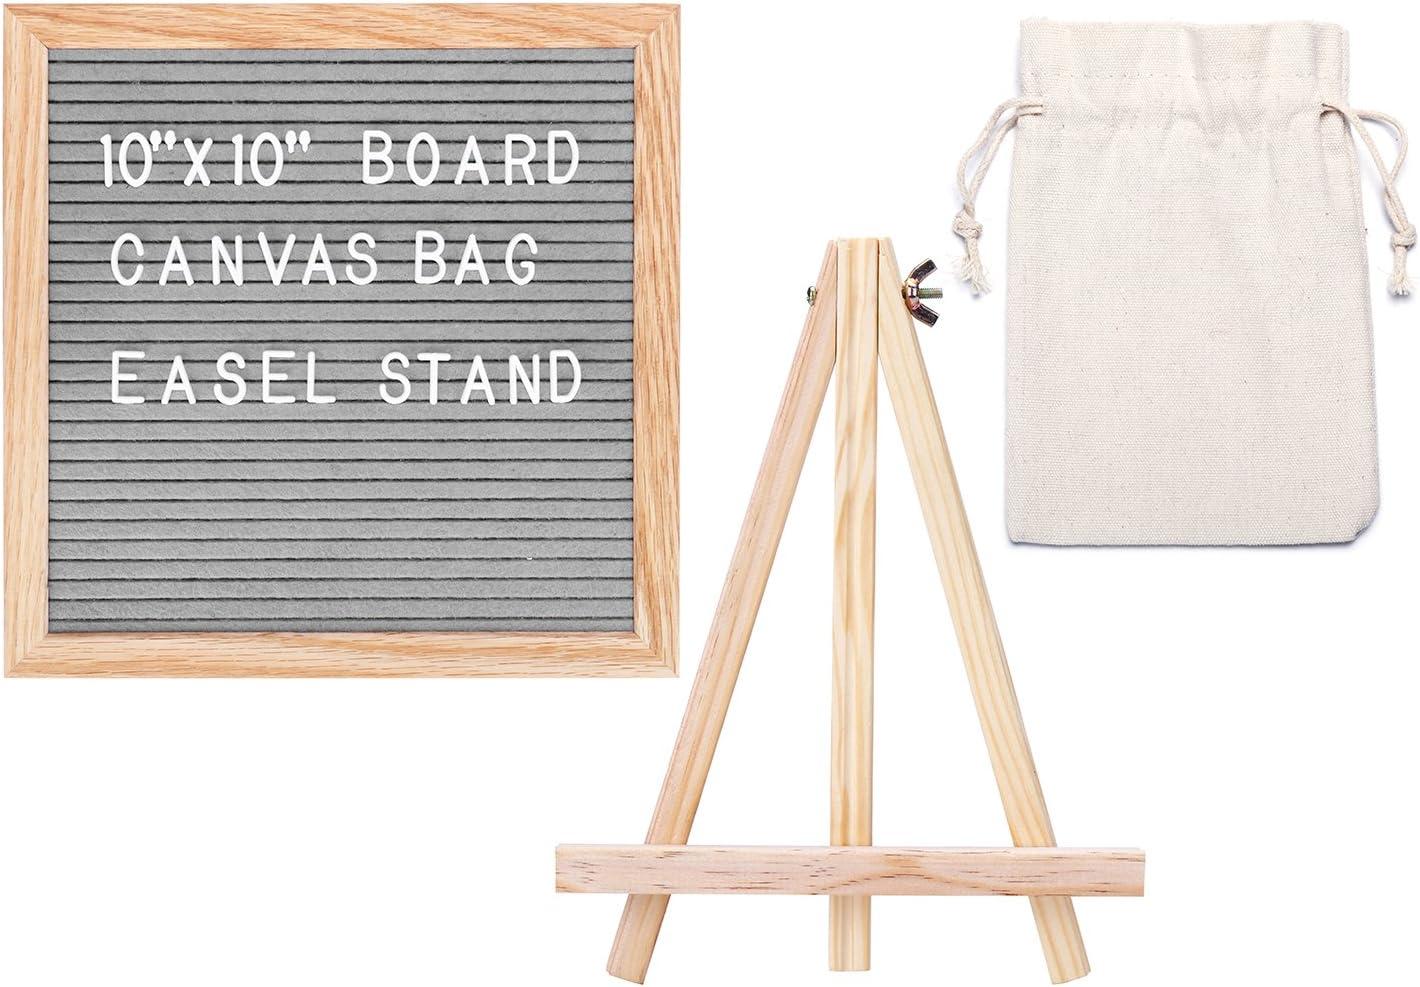 Rose Kuli Felt Letter Board 10x10 Inch Changeable Message Board 352 Letters Numbers Emoji Symbols with Solid Oak Frame Free Stand Scissor Canvas Bag